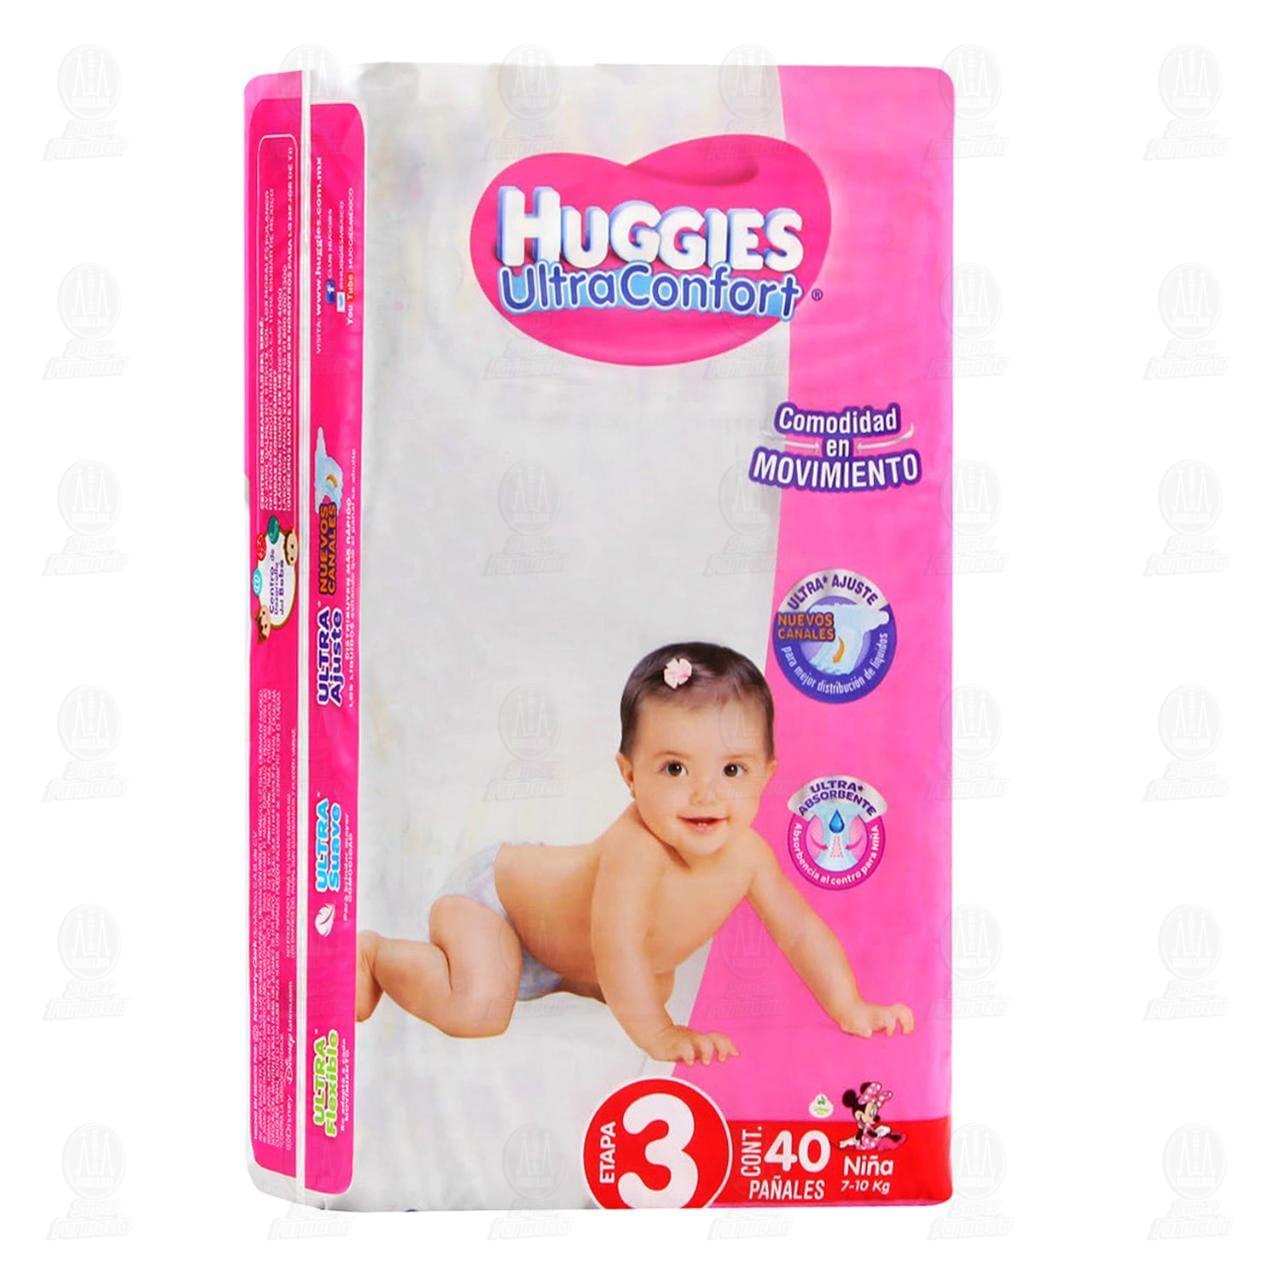 Comprar Pañales para Bebé Huggies UltraConfort Etapa 3 Niña, 40 pzas. en Farmacias Guadalajara